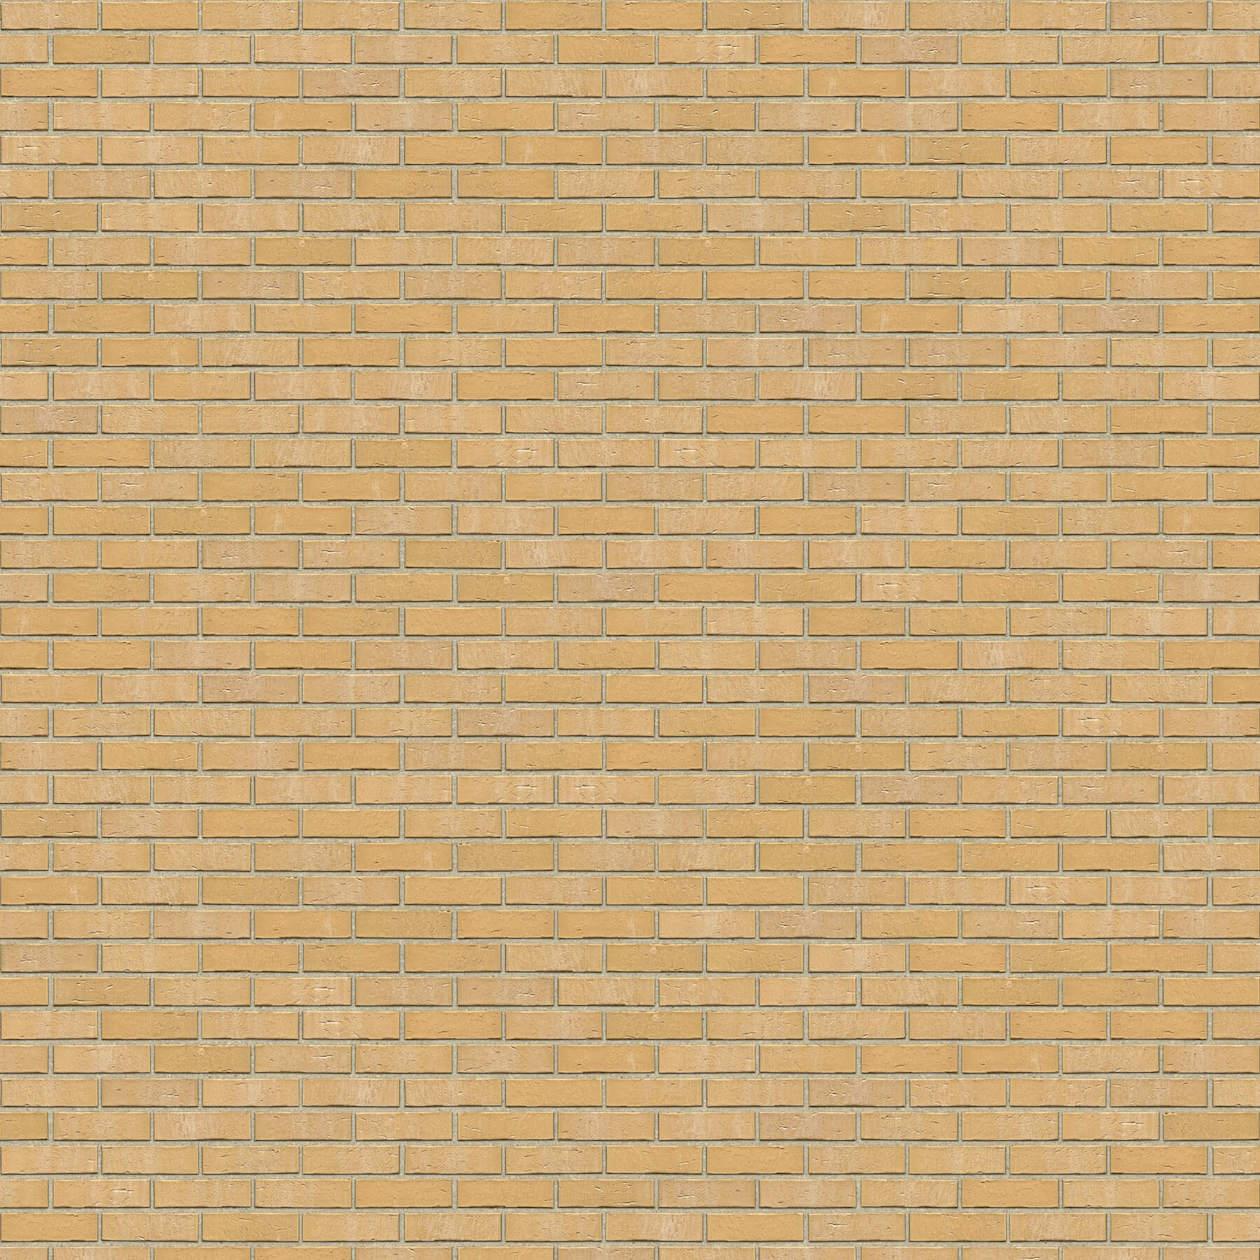 Puna-cigla-FeldHaus-Klinker-brick-house-nf-k-762-Bez Fuga